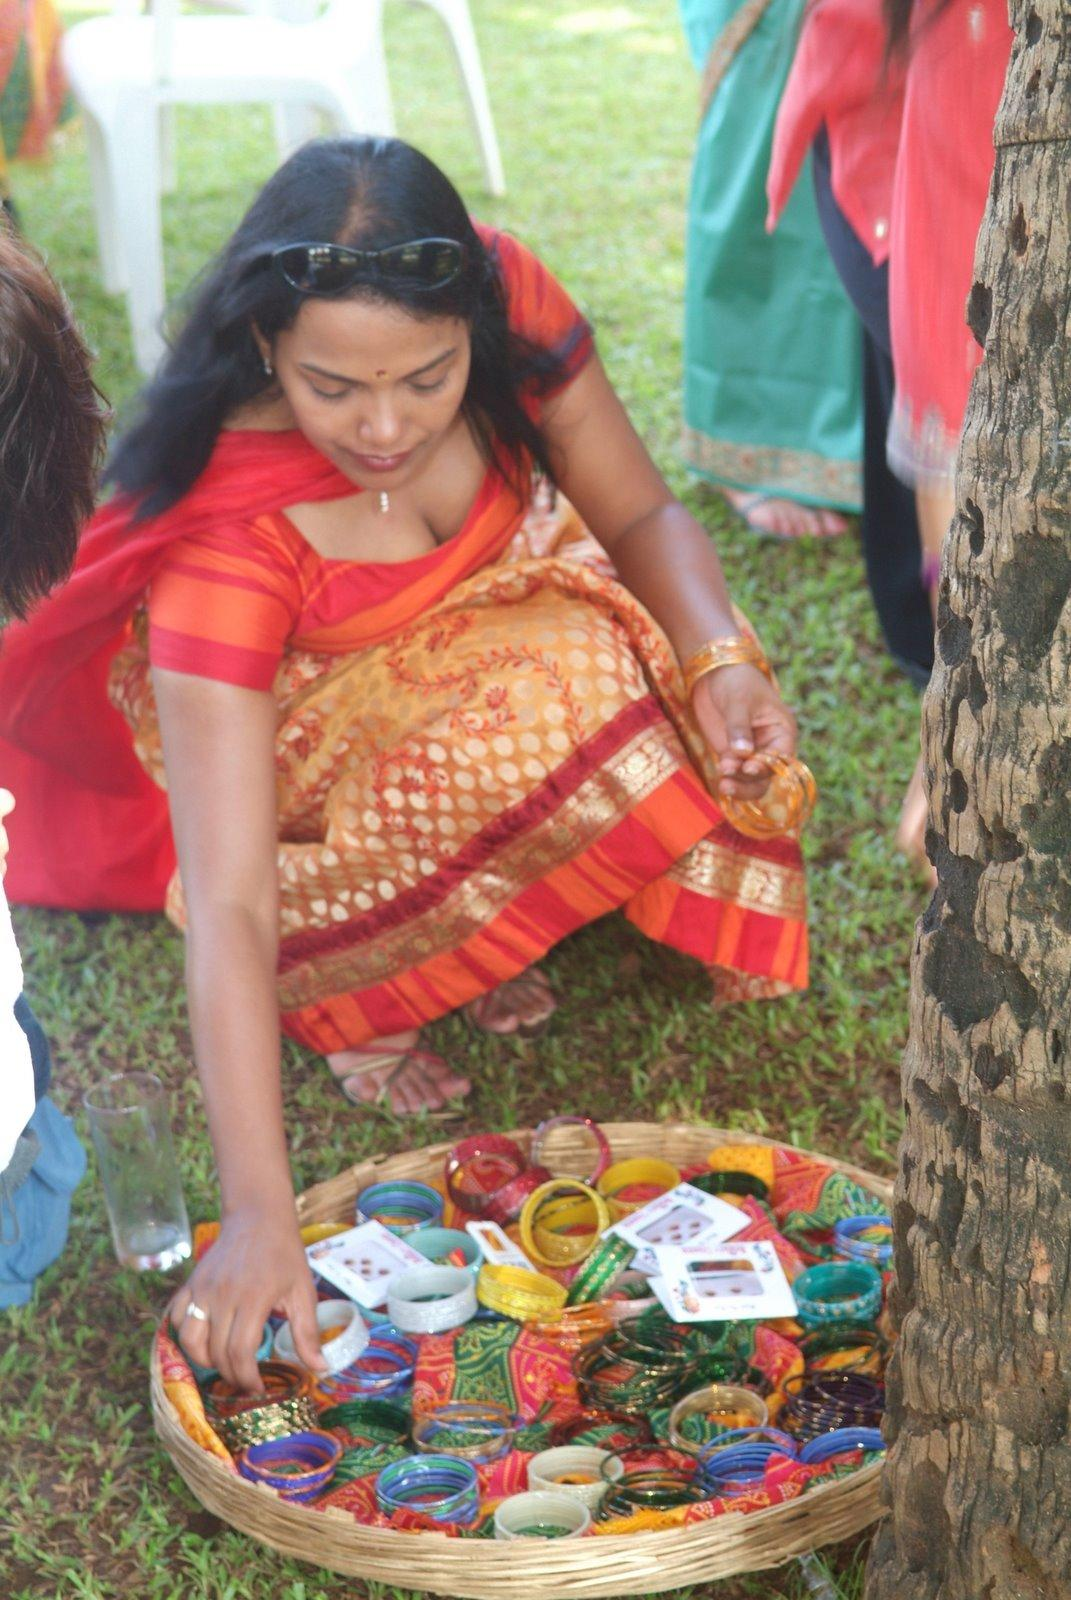 Village aunty fuck hidden camera see more wwwdatelivefun - 3 4